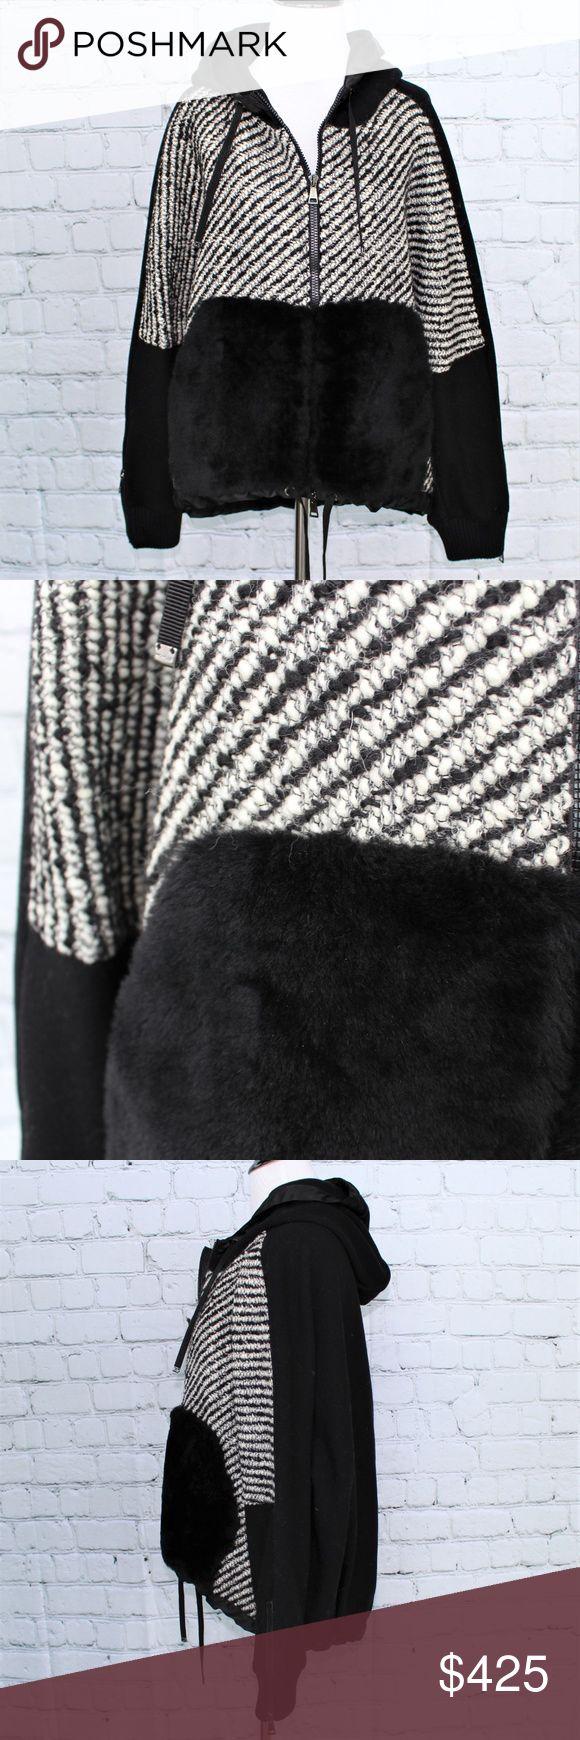 Moncler Black & White Partial Fur Jacket Black and white